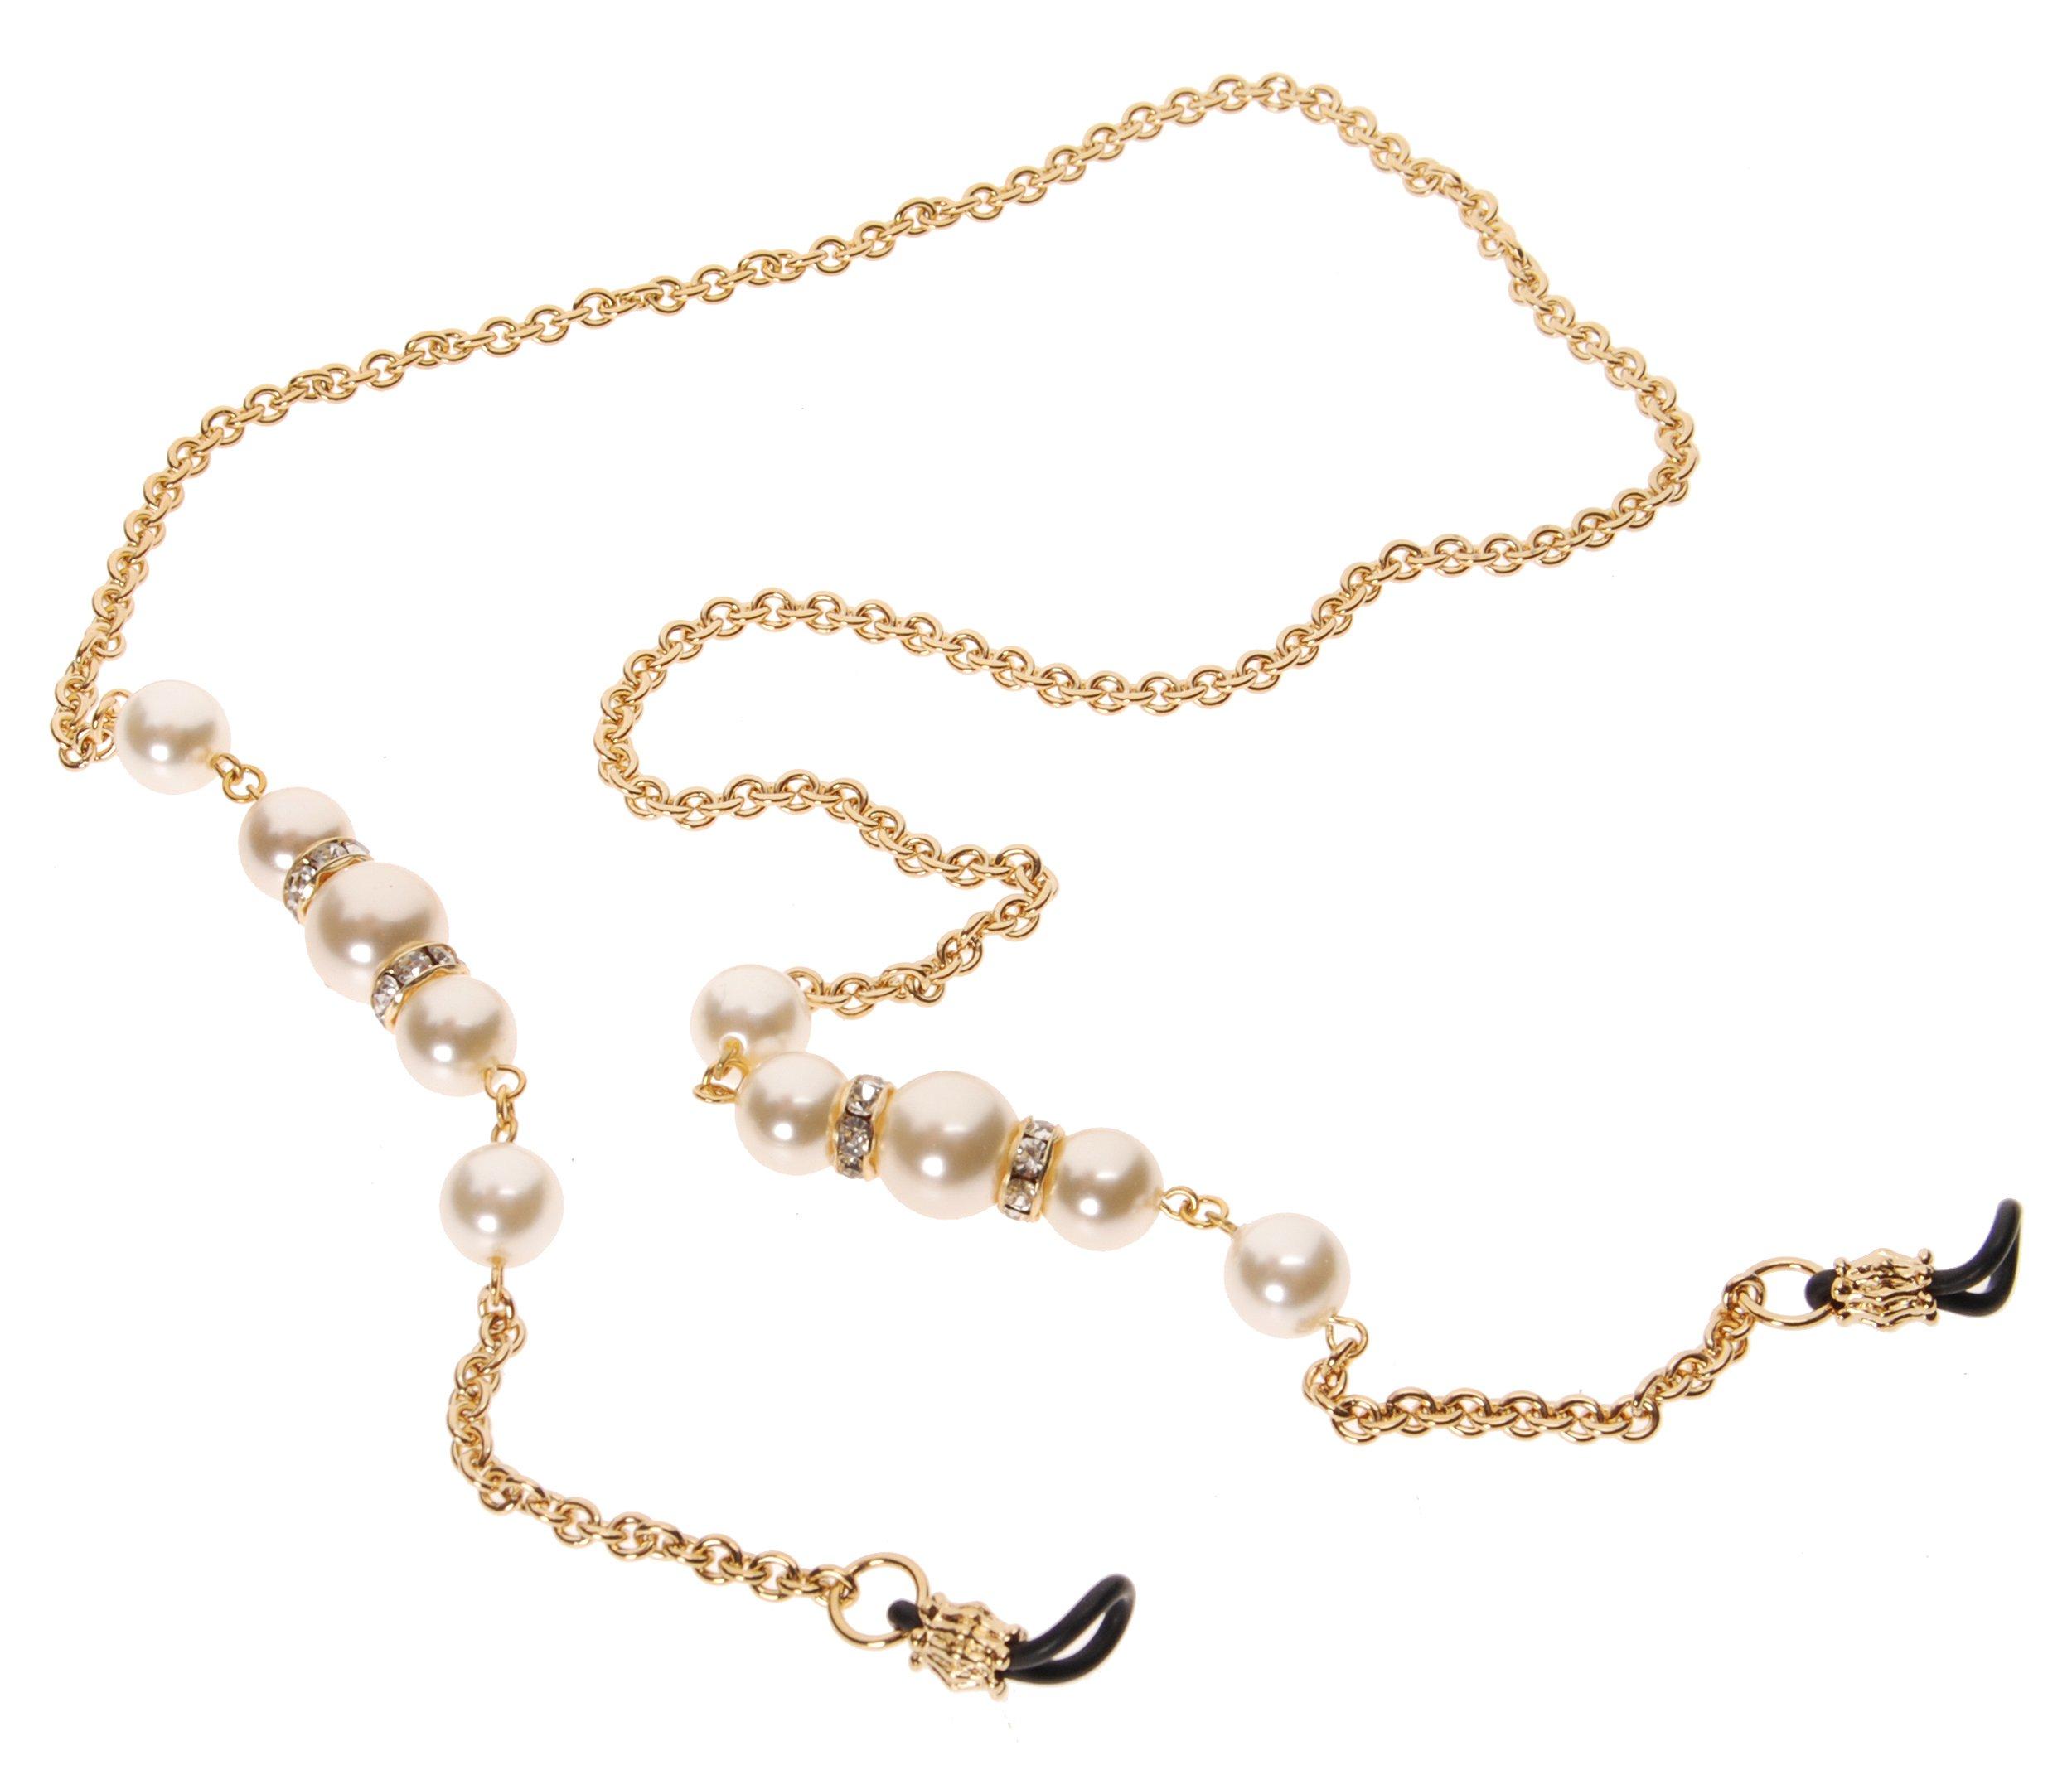 L. Erickson Cadabra Eyeglass Chain - Cream Pearl/Crystal/Gold